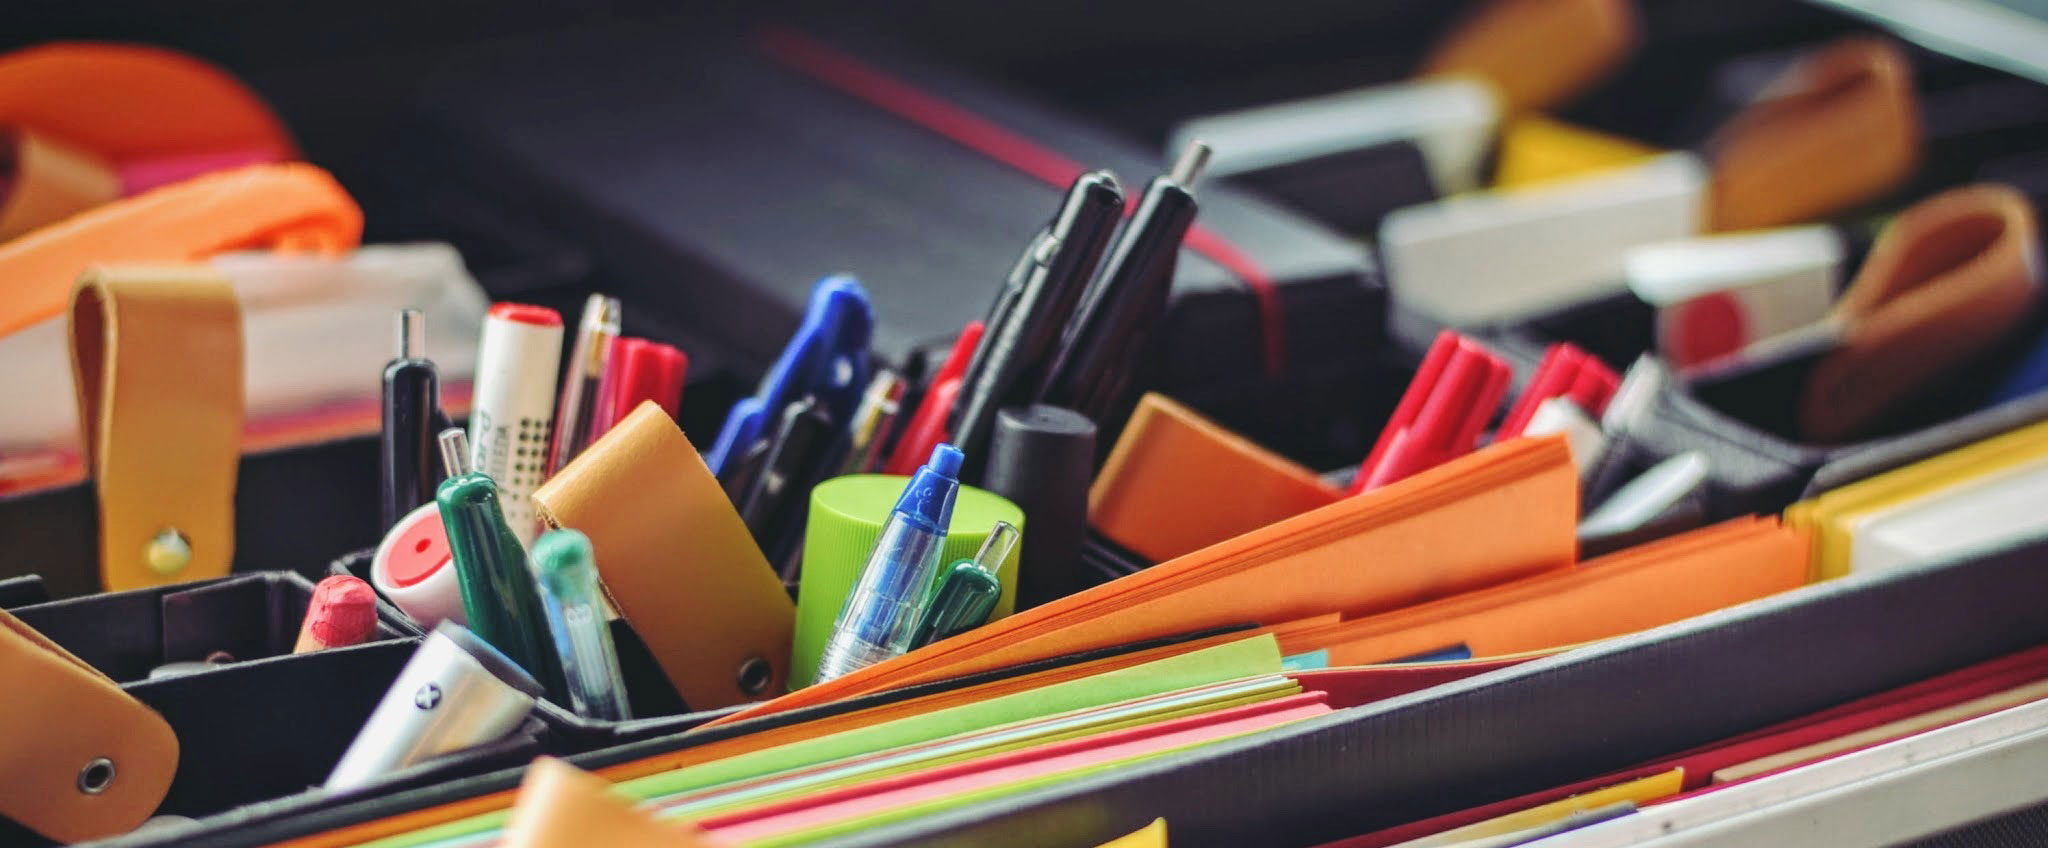 Do productive tools and best practice methods nurture engagement?